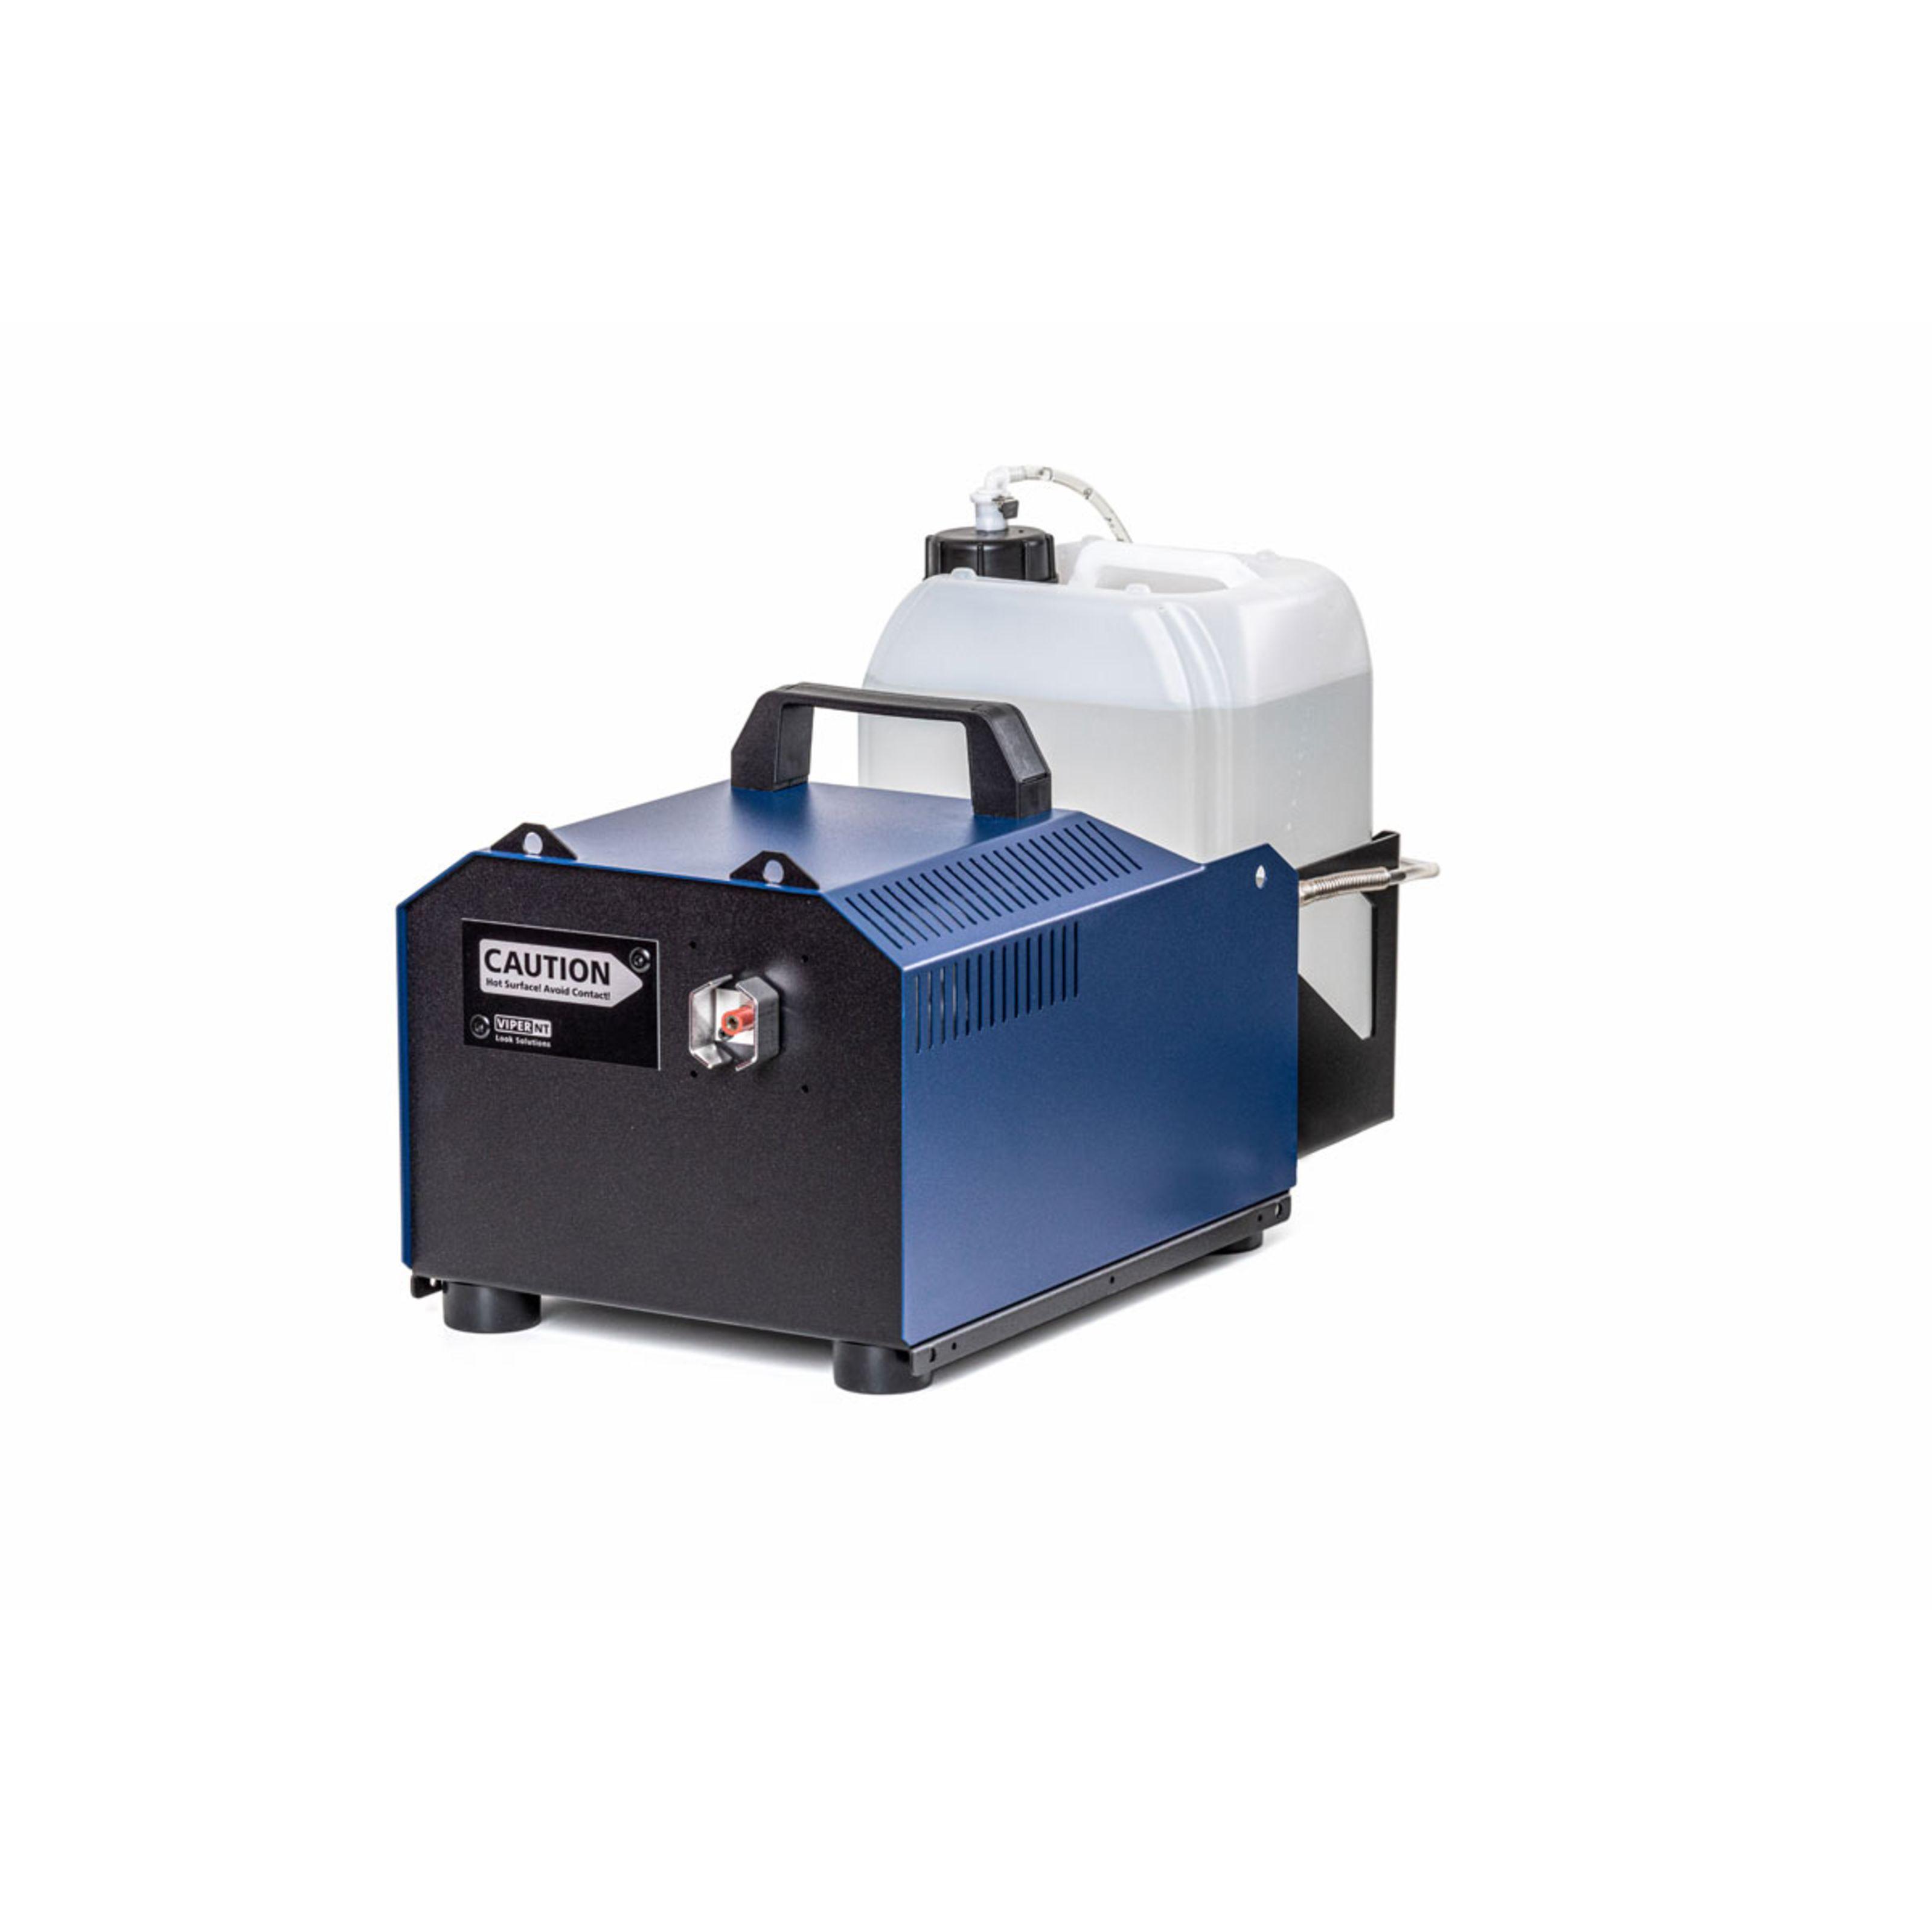 Look Solutions - Viper NT Nebelmaschine DMX, 1300 W Heizleistung 190